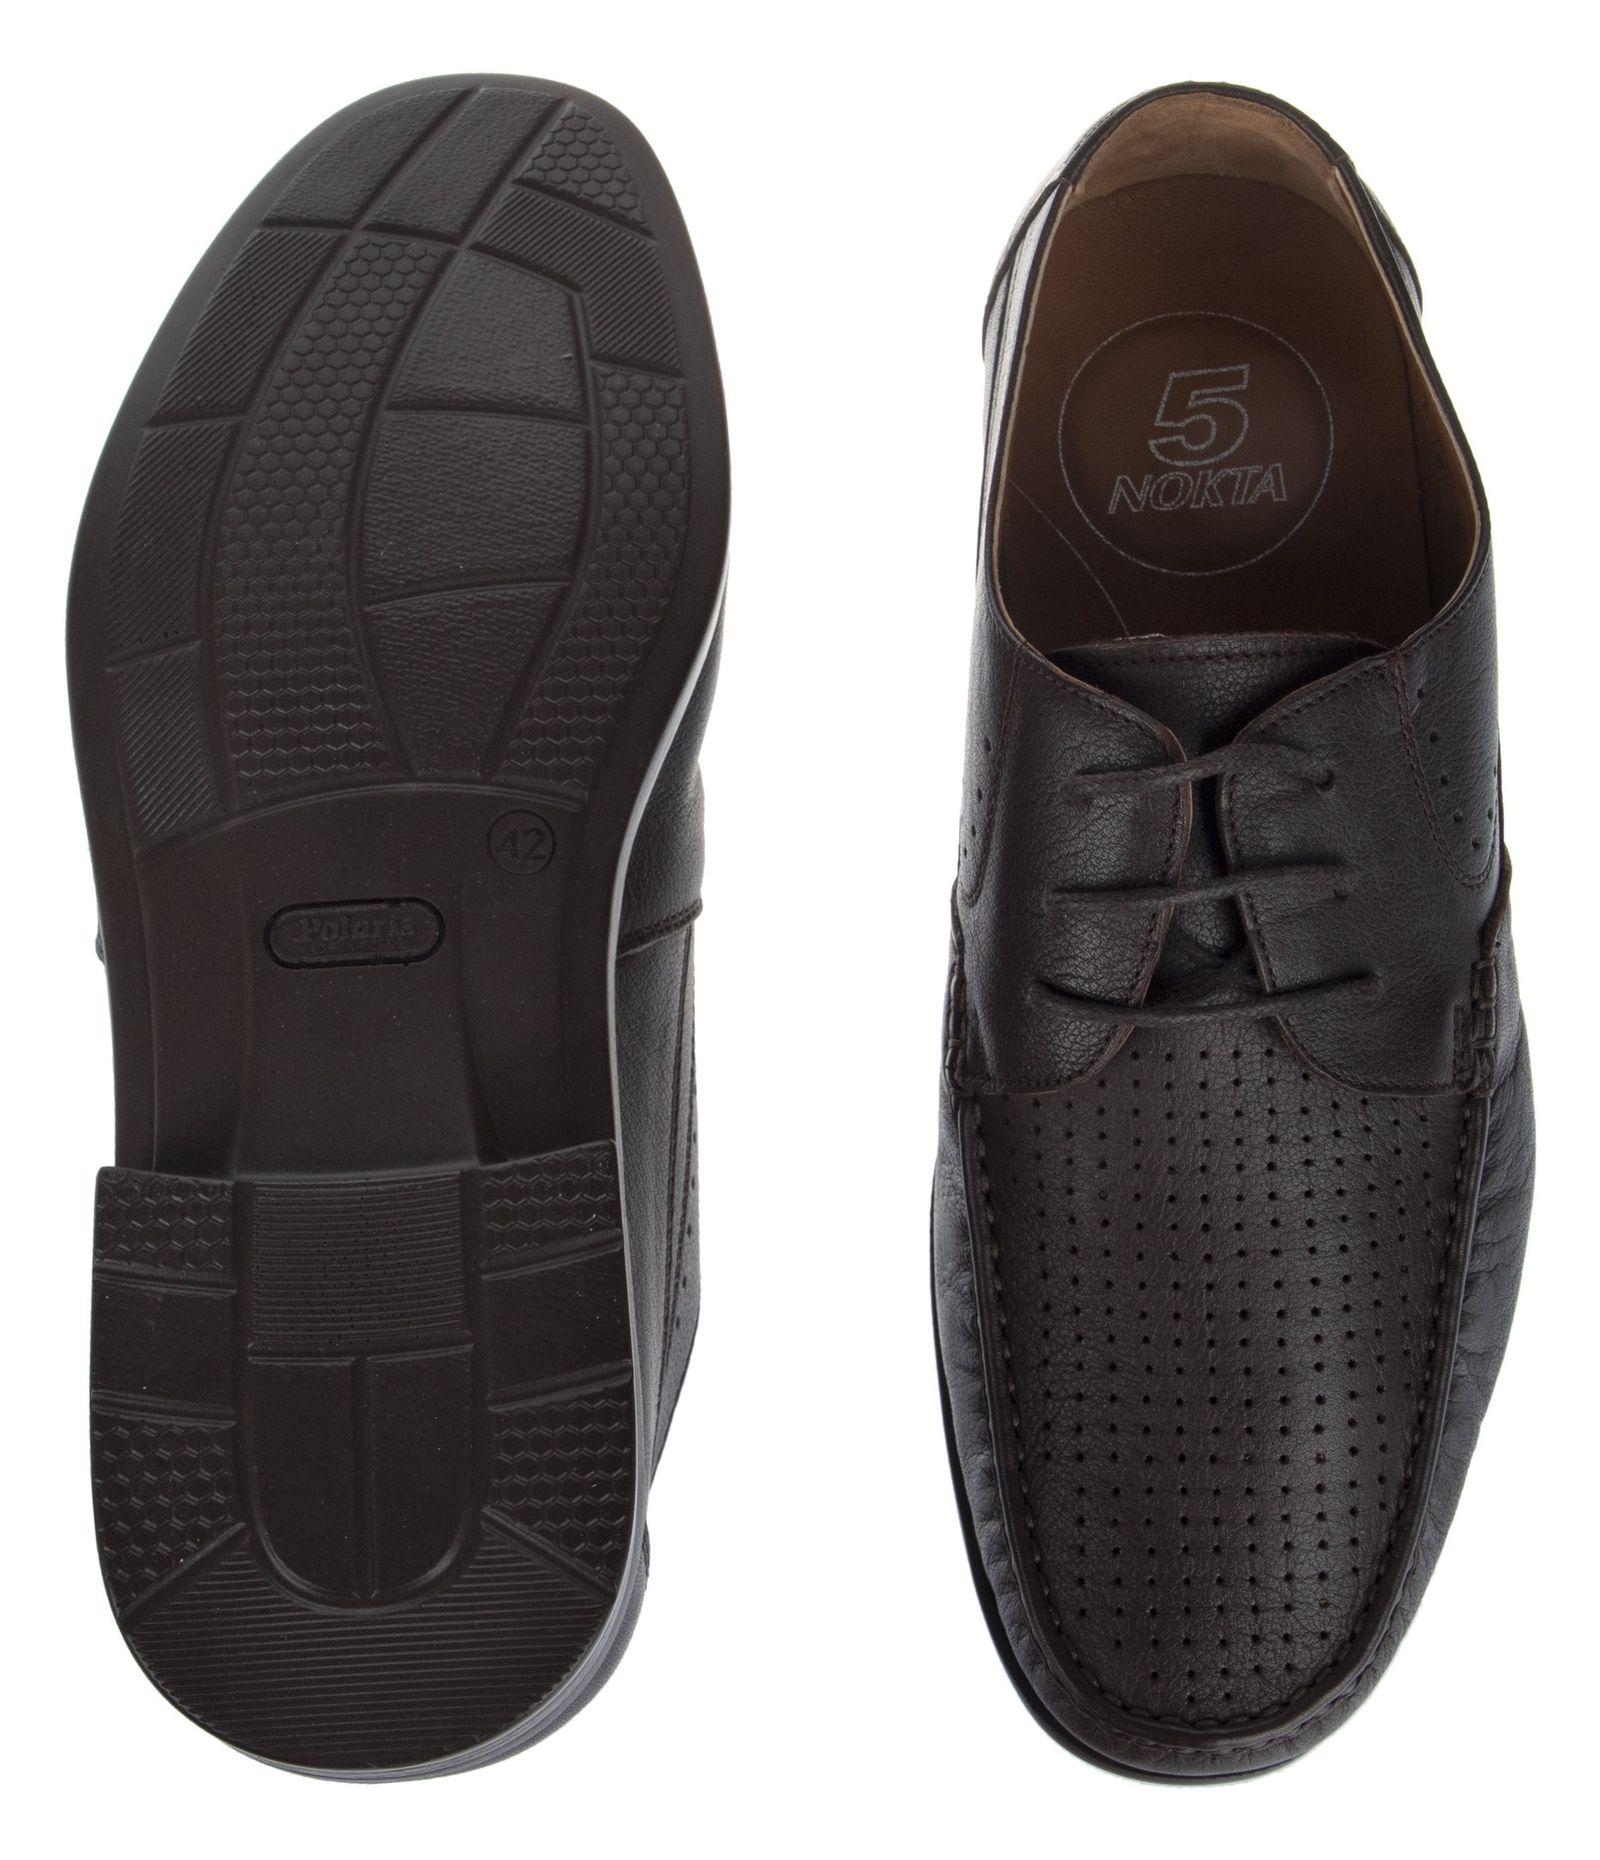 کفش روزمره مردانه پولاریس مدل 100296904-103 - قهوه ای - 7